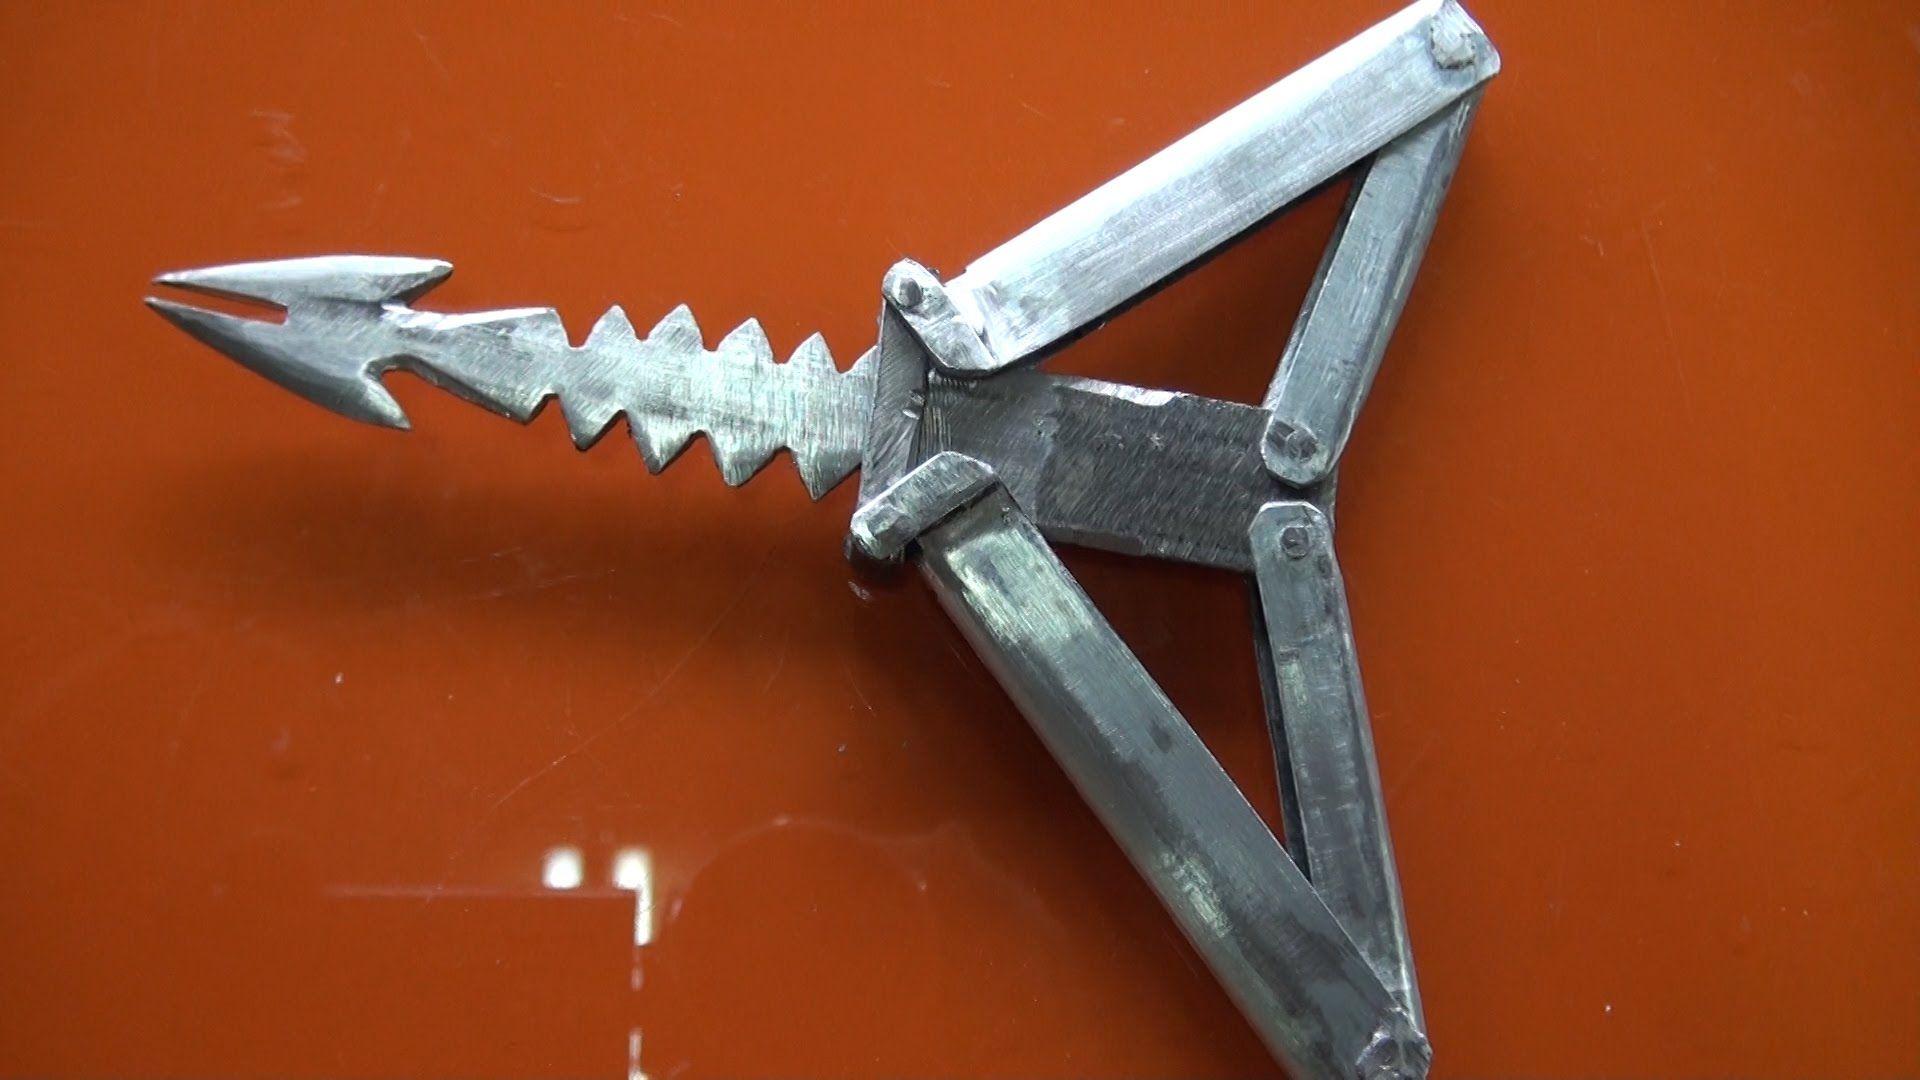 Thor - Armas ocultas | Proyectos que intentar | Pinterest | Thor ...